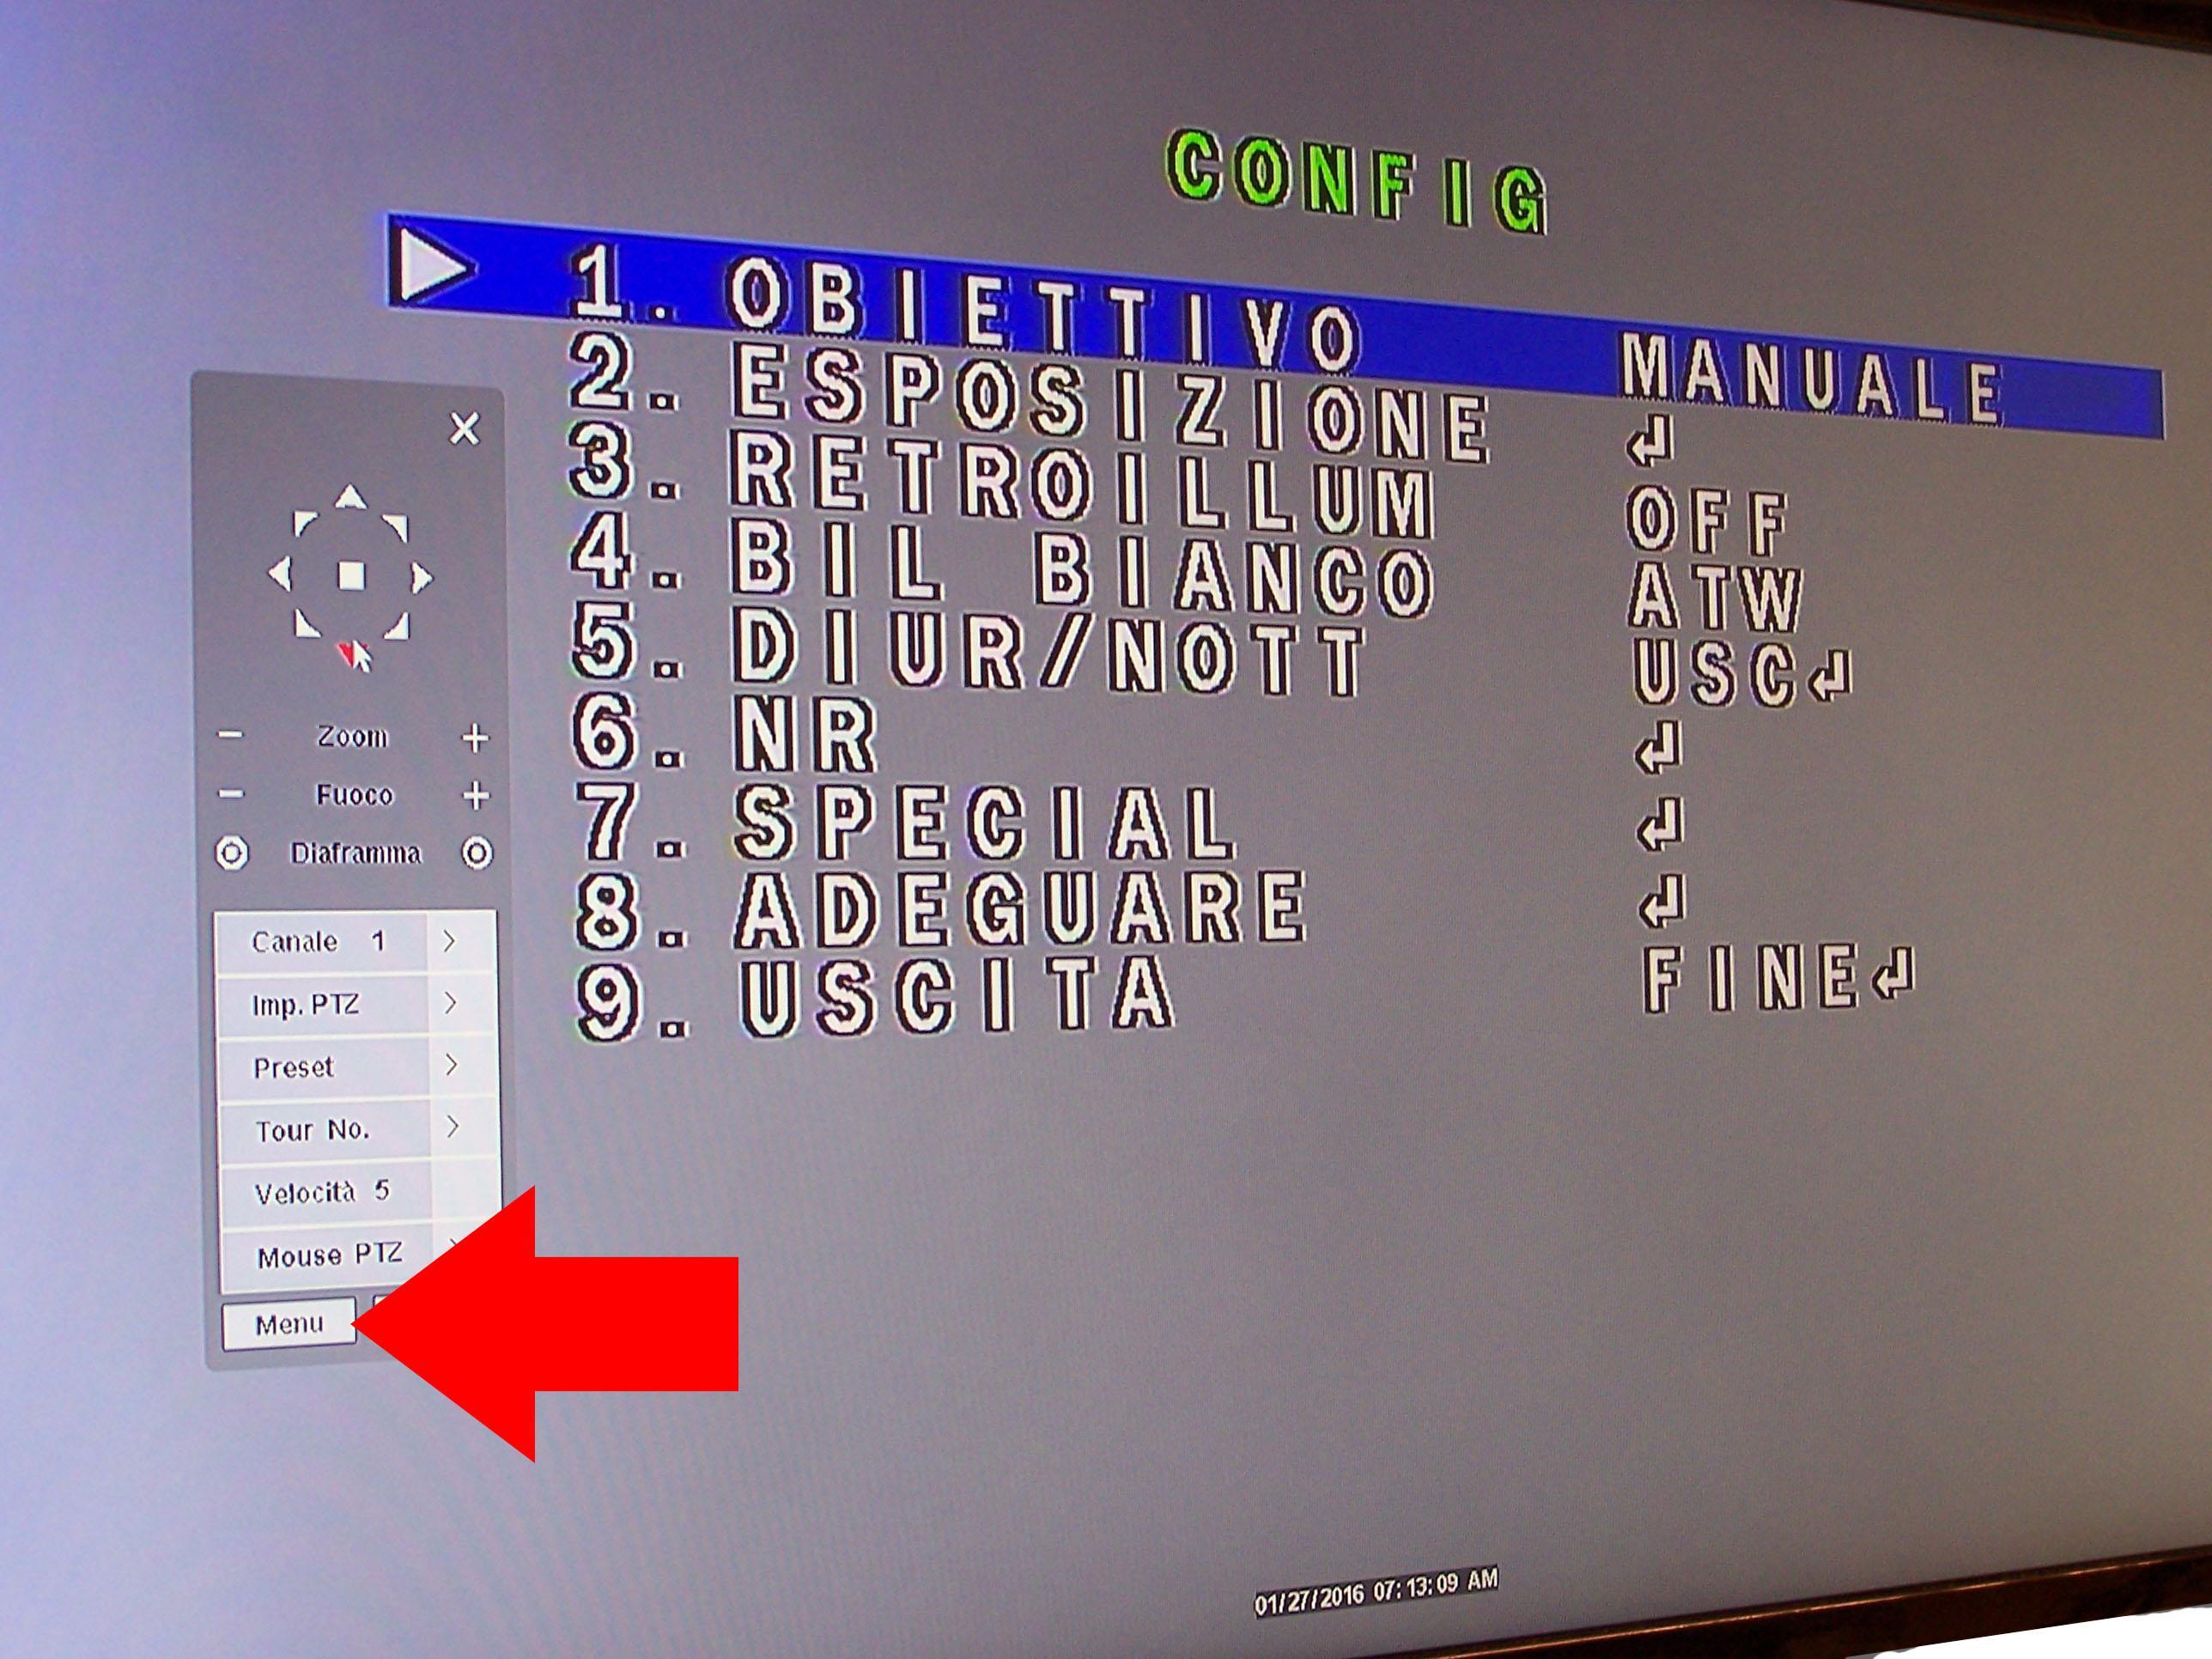 cctv 5 programm guide